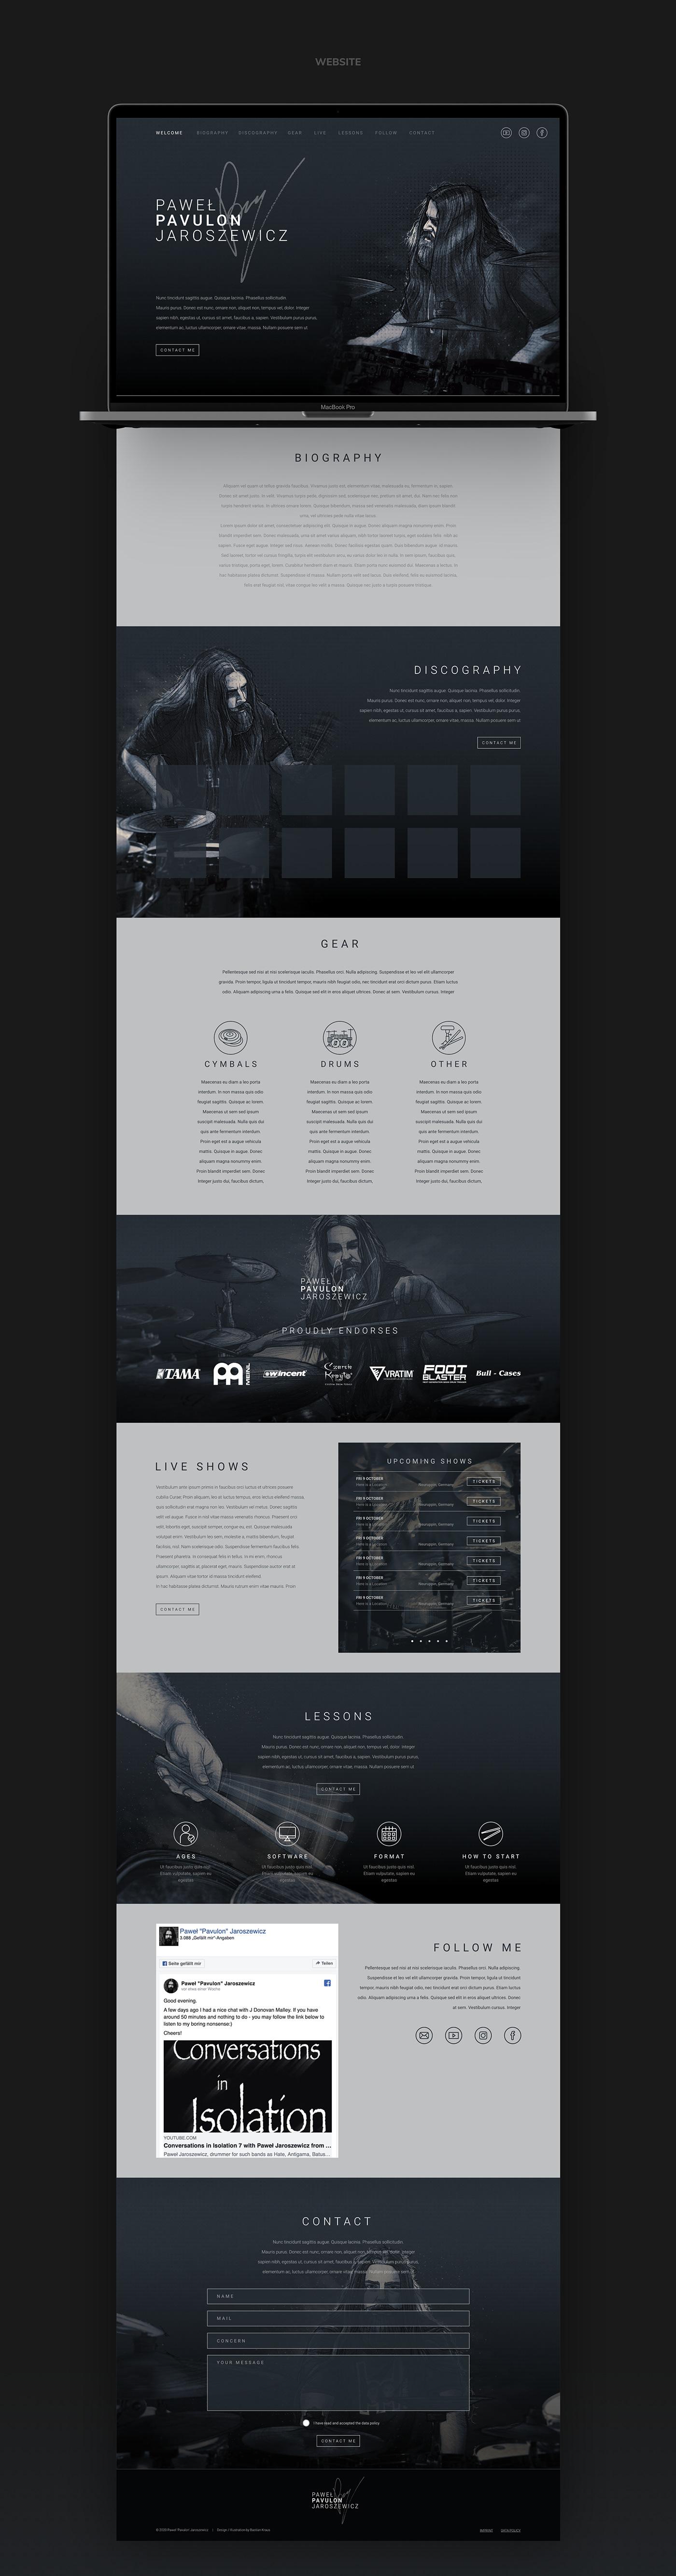 PAVULON // Website